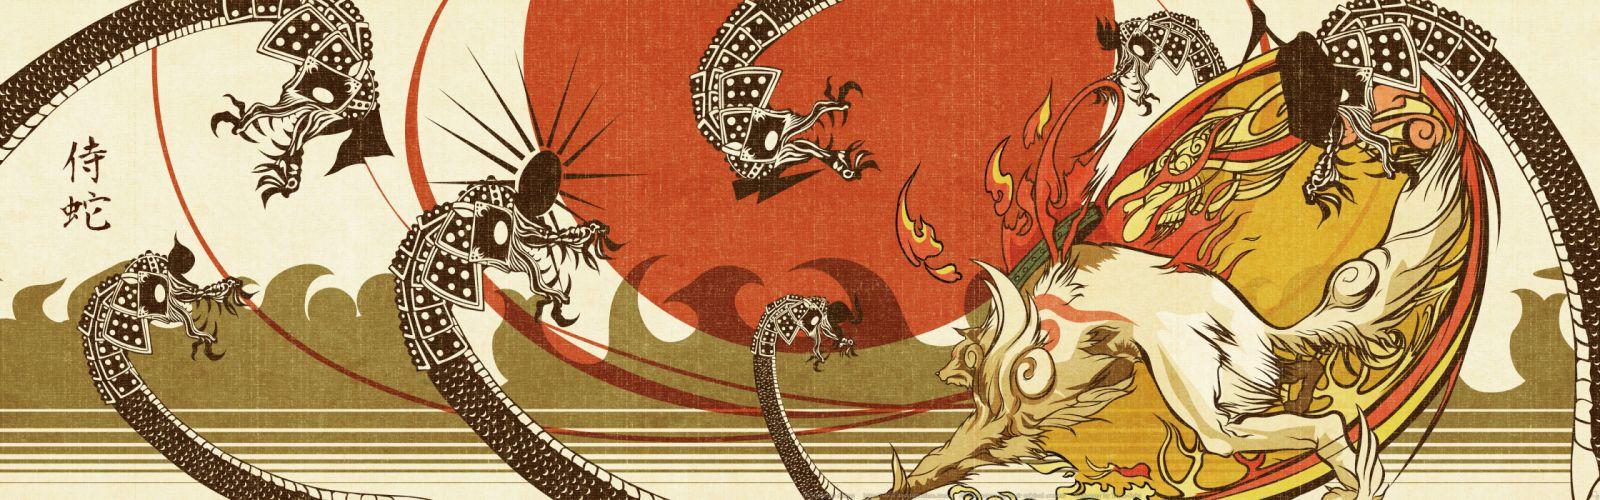 amaterasu dualscreen okami scan wallpaper